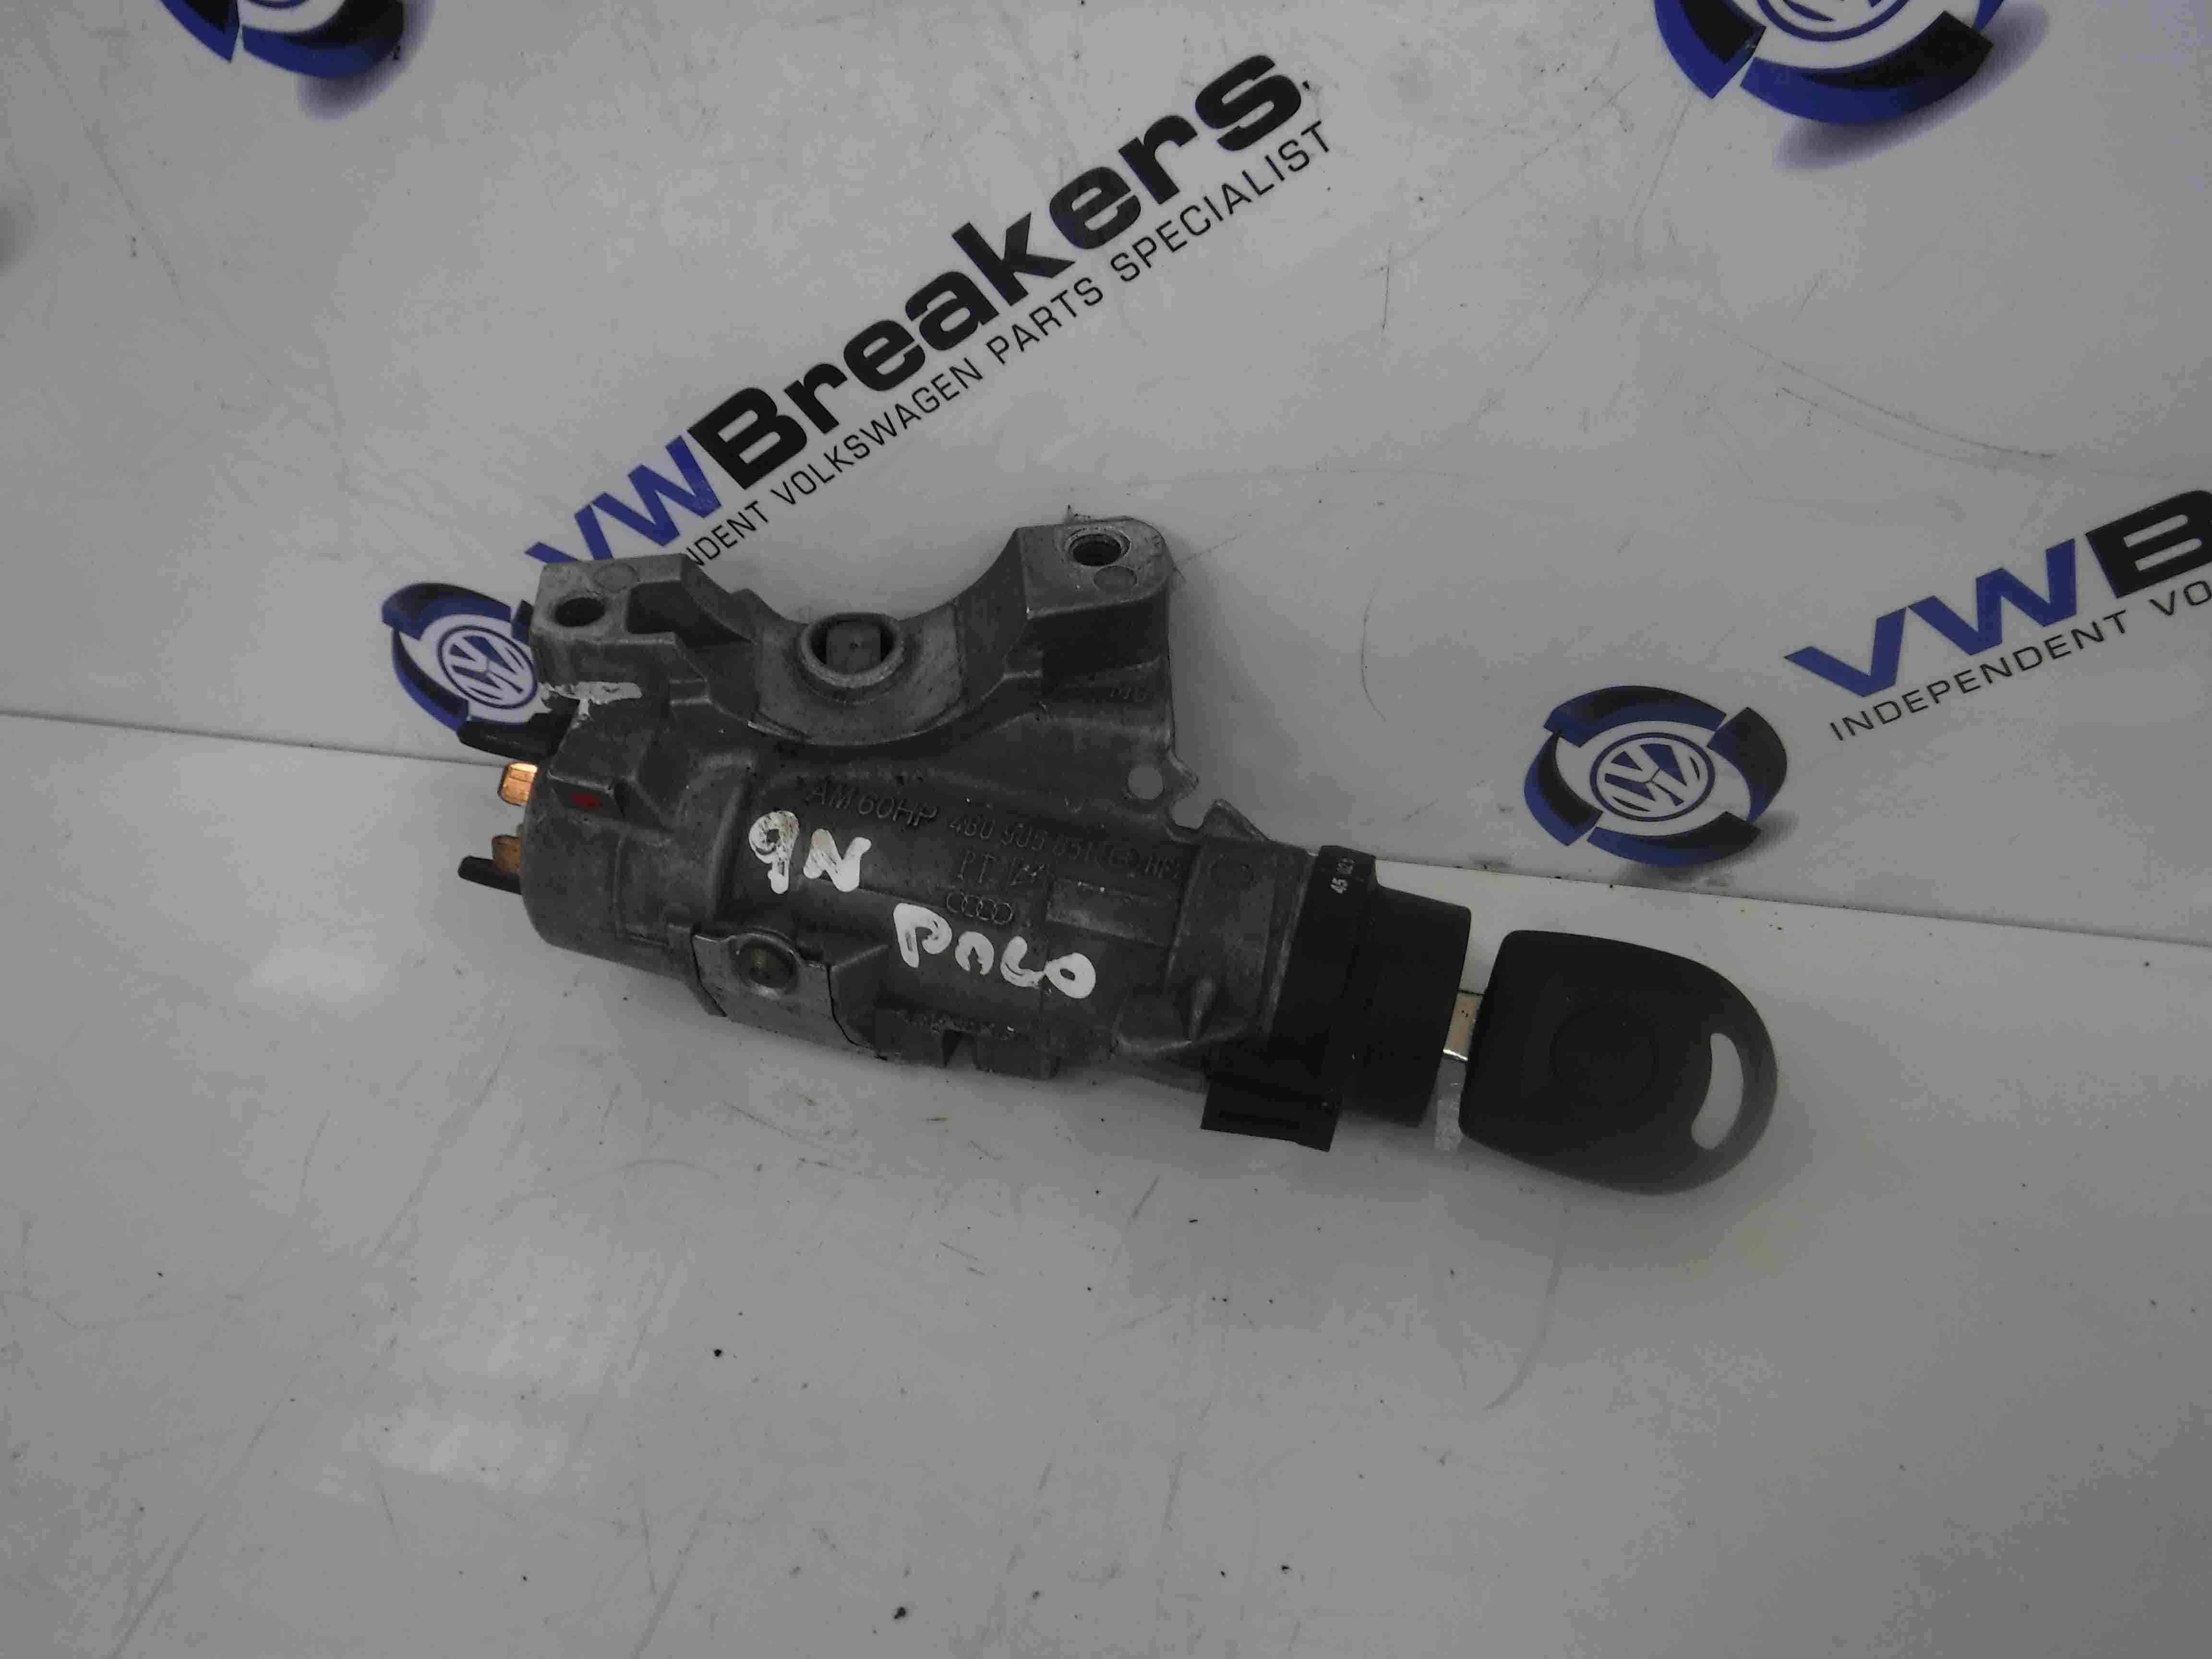 Volkswagen Polo 2003-2006 9N Ignition Barrel + Key 4B0905851G